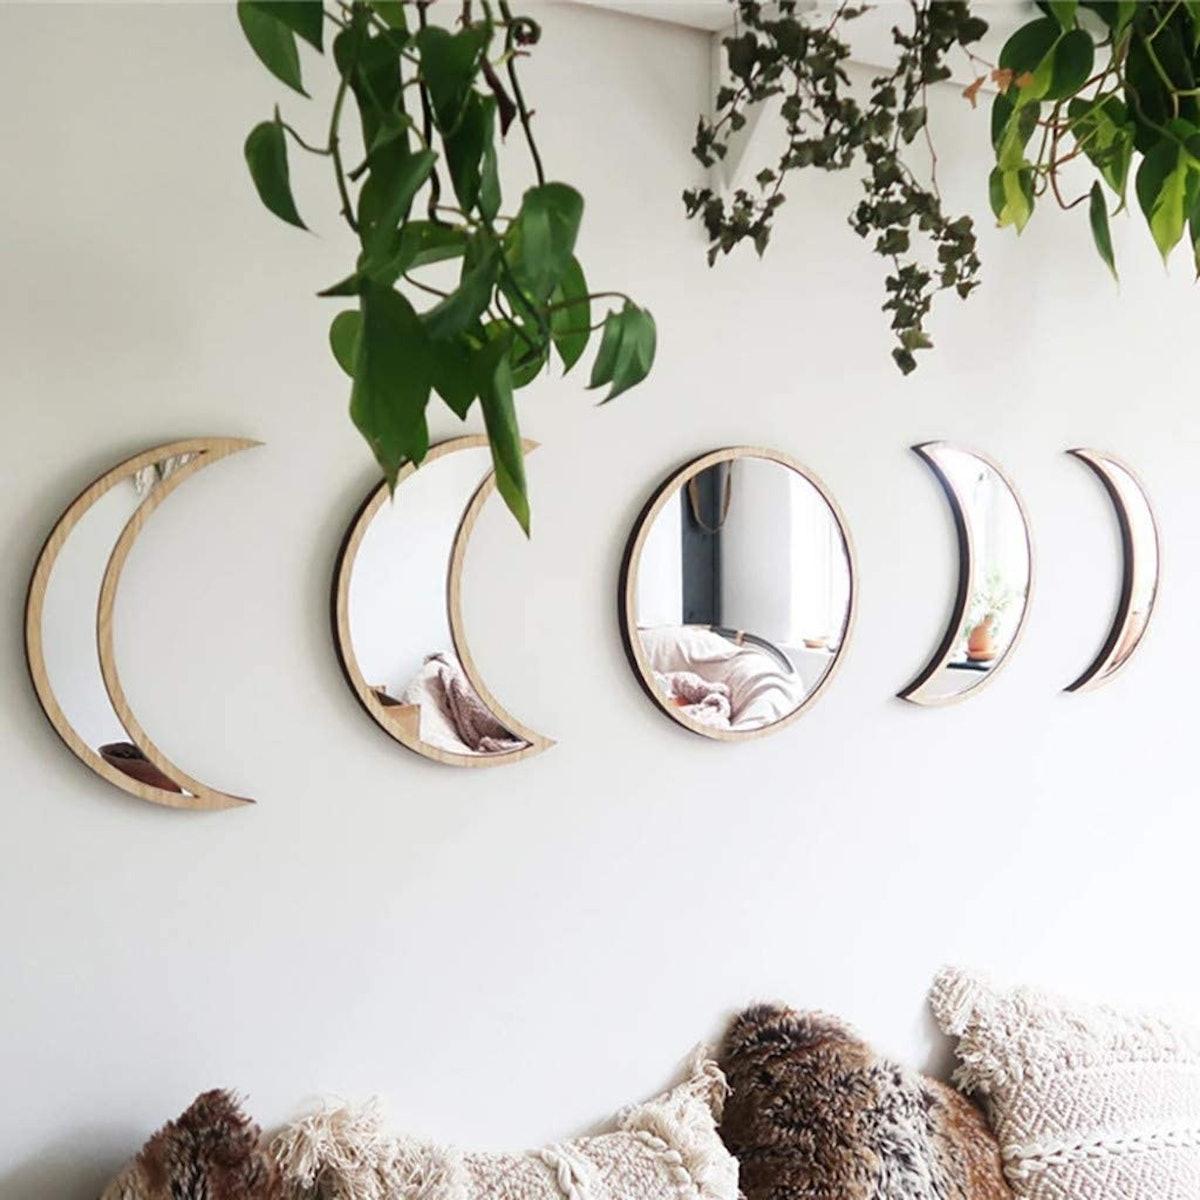 Scandinavian Natural Decor Moon Phase Mirrors (5 Pieces)